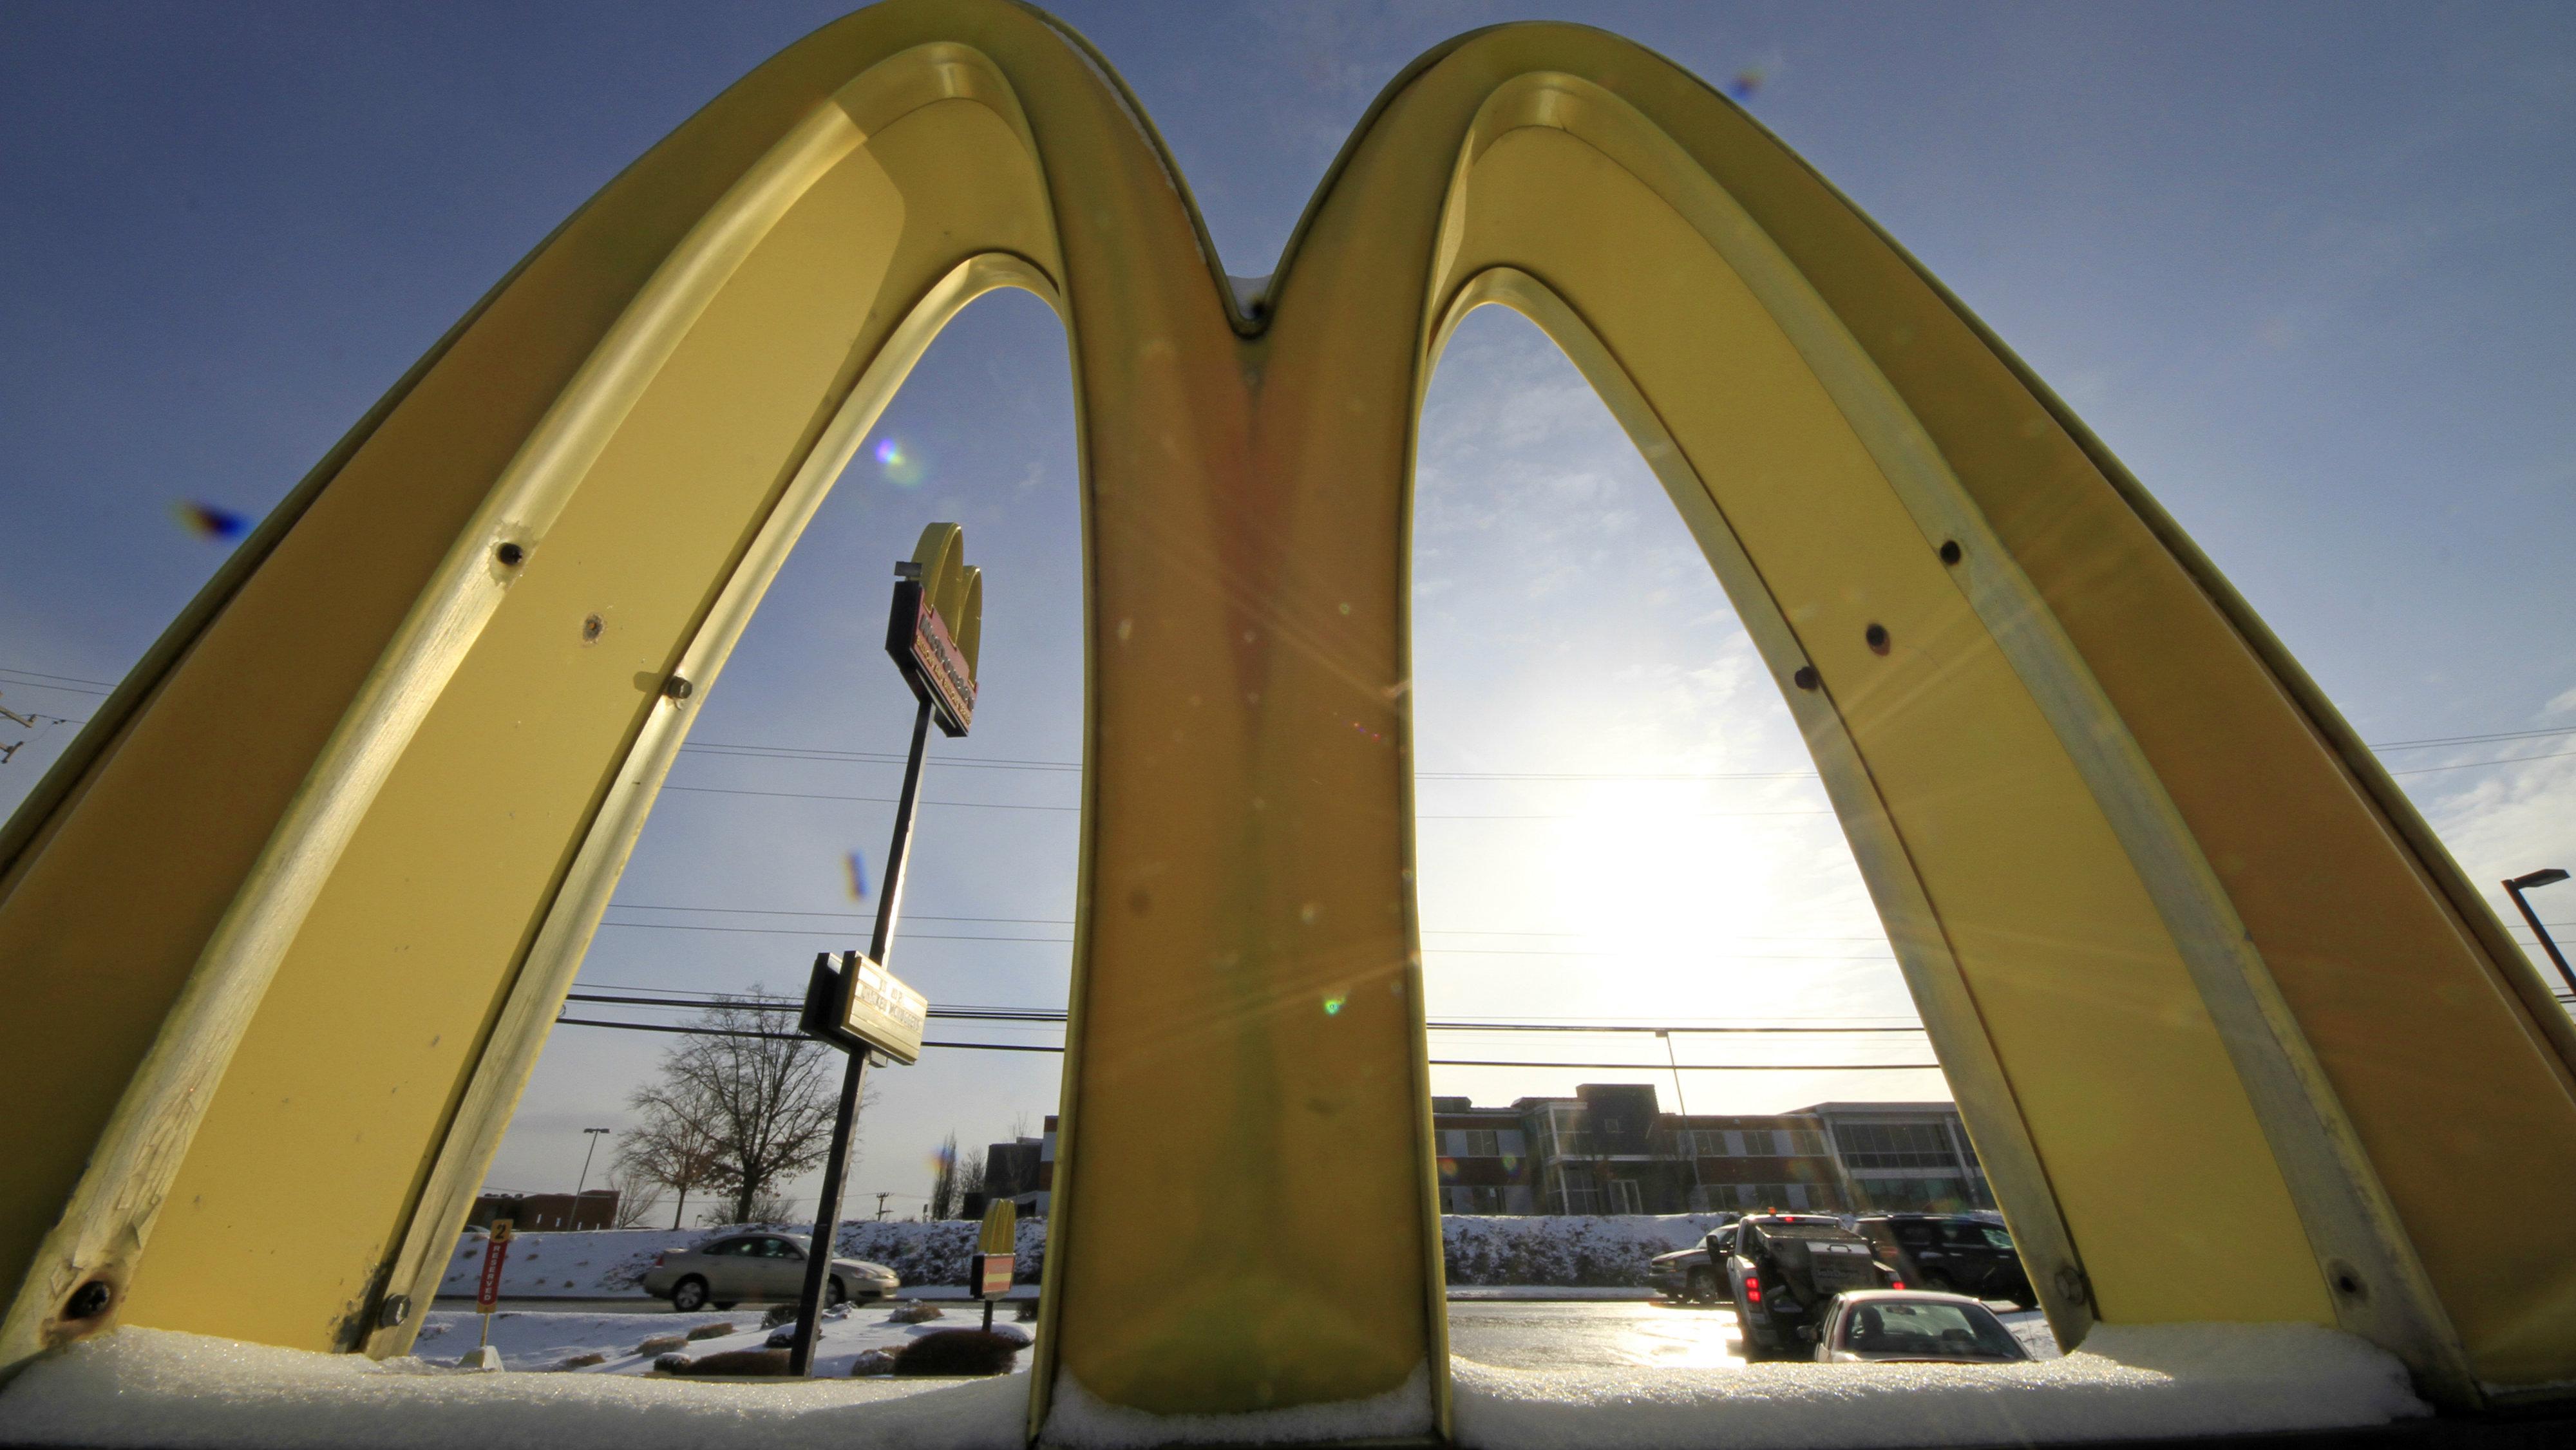 mcdonald's-sales-turnaround-plan-chipotle 2